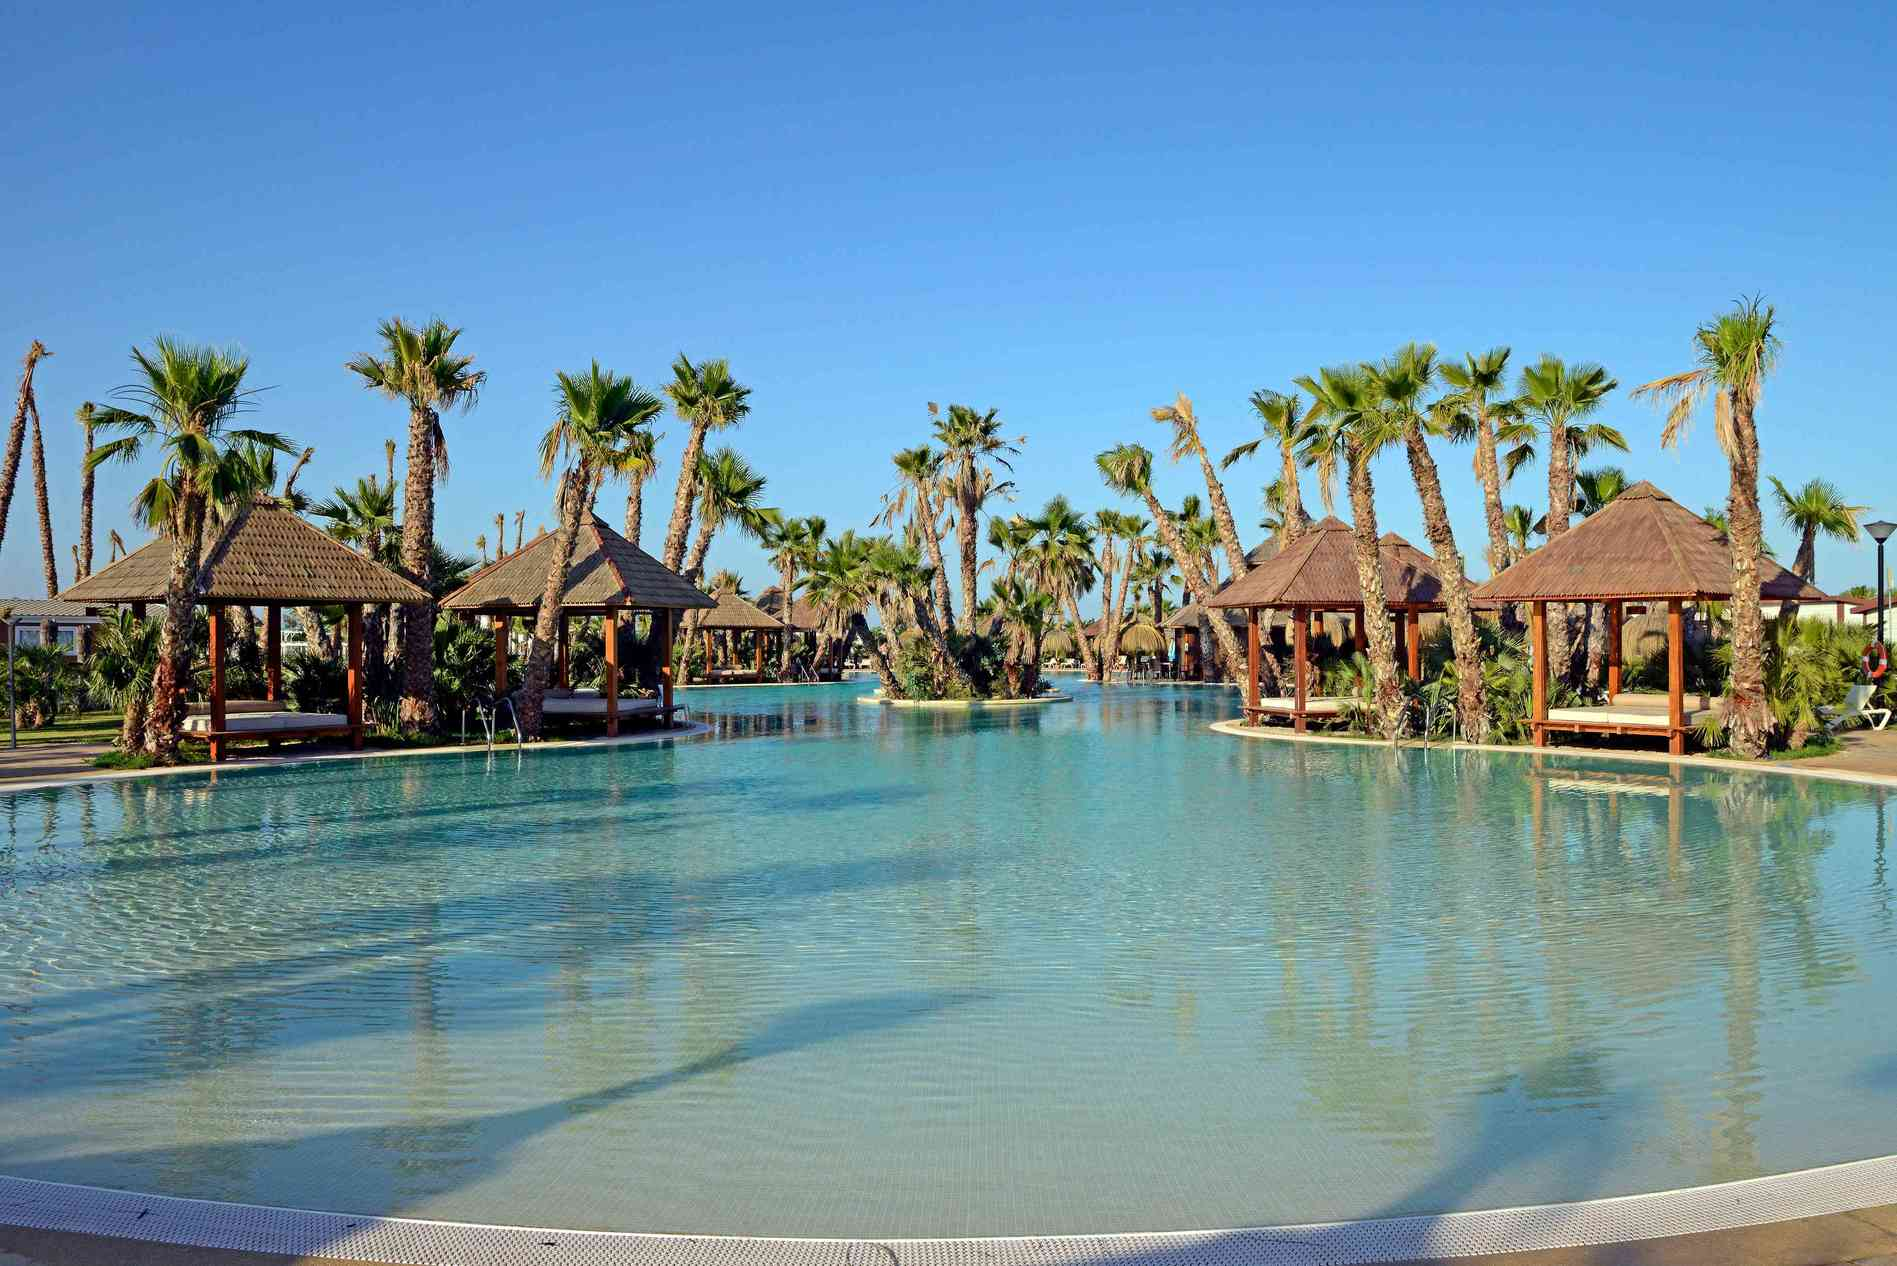 Alannia Resorts Costa Blanca